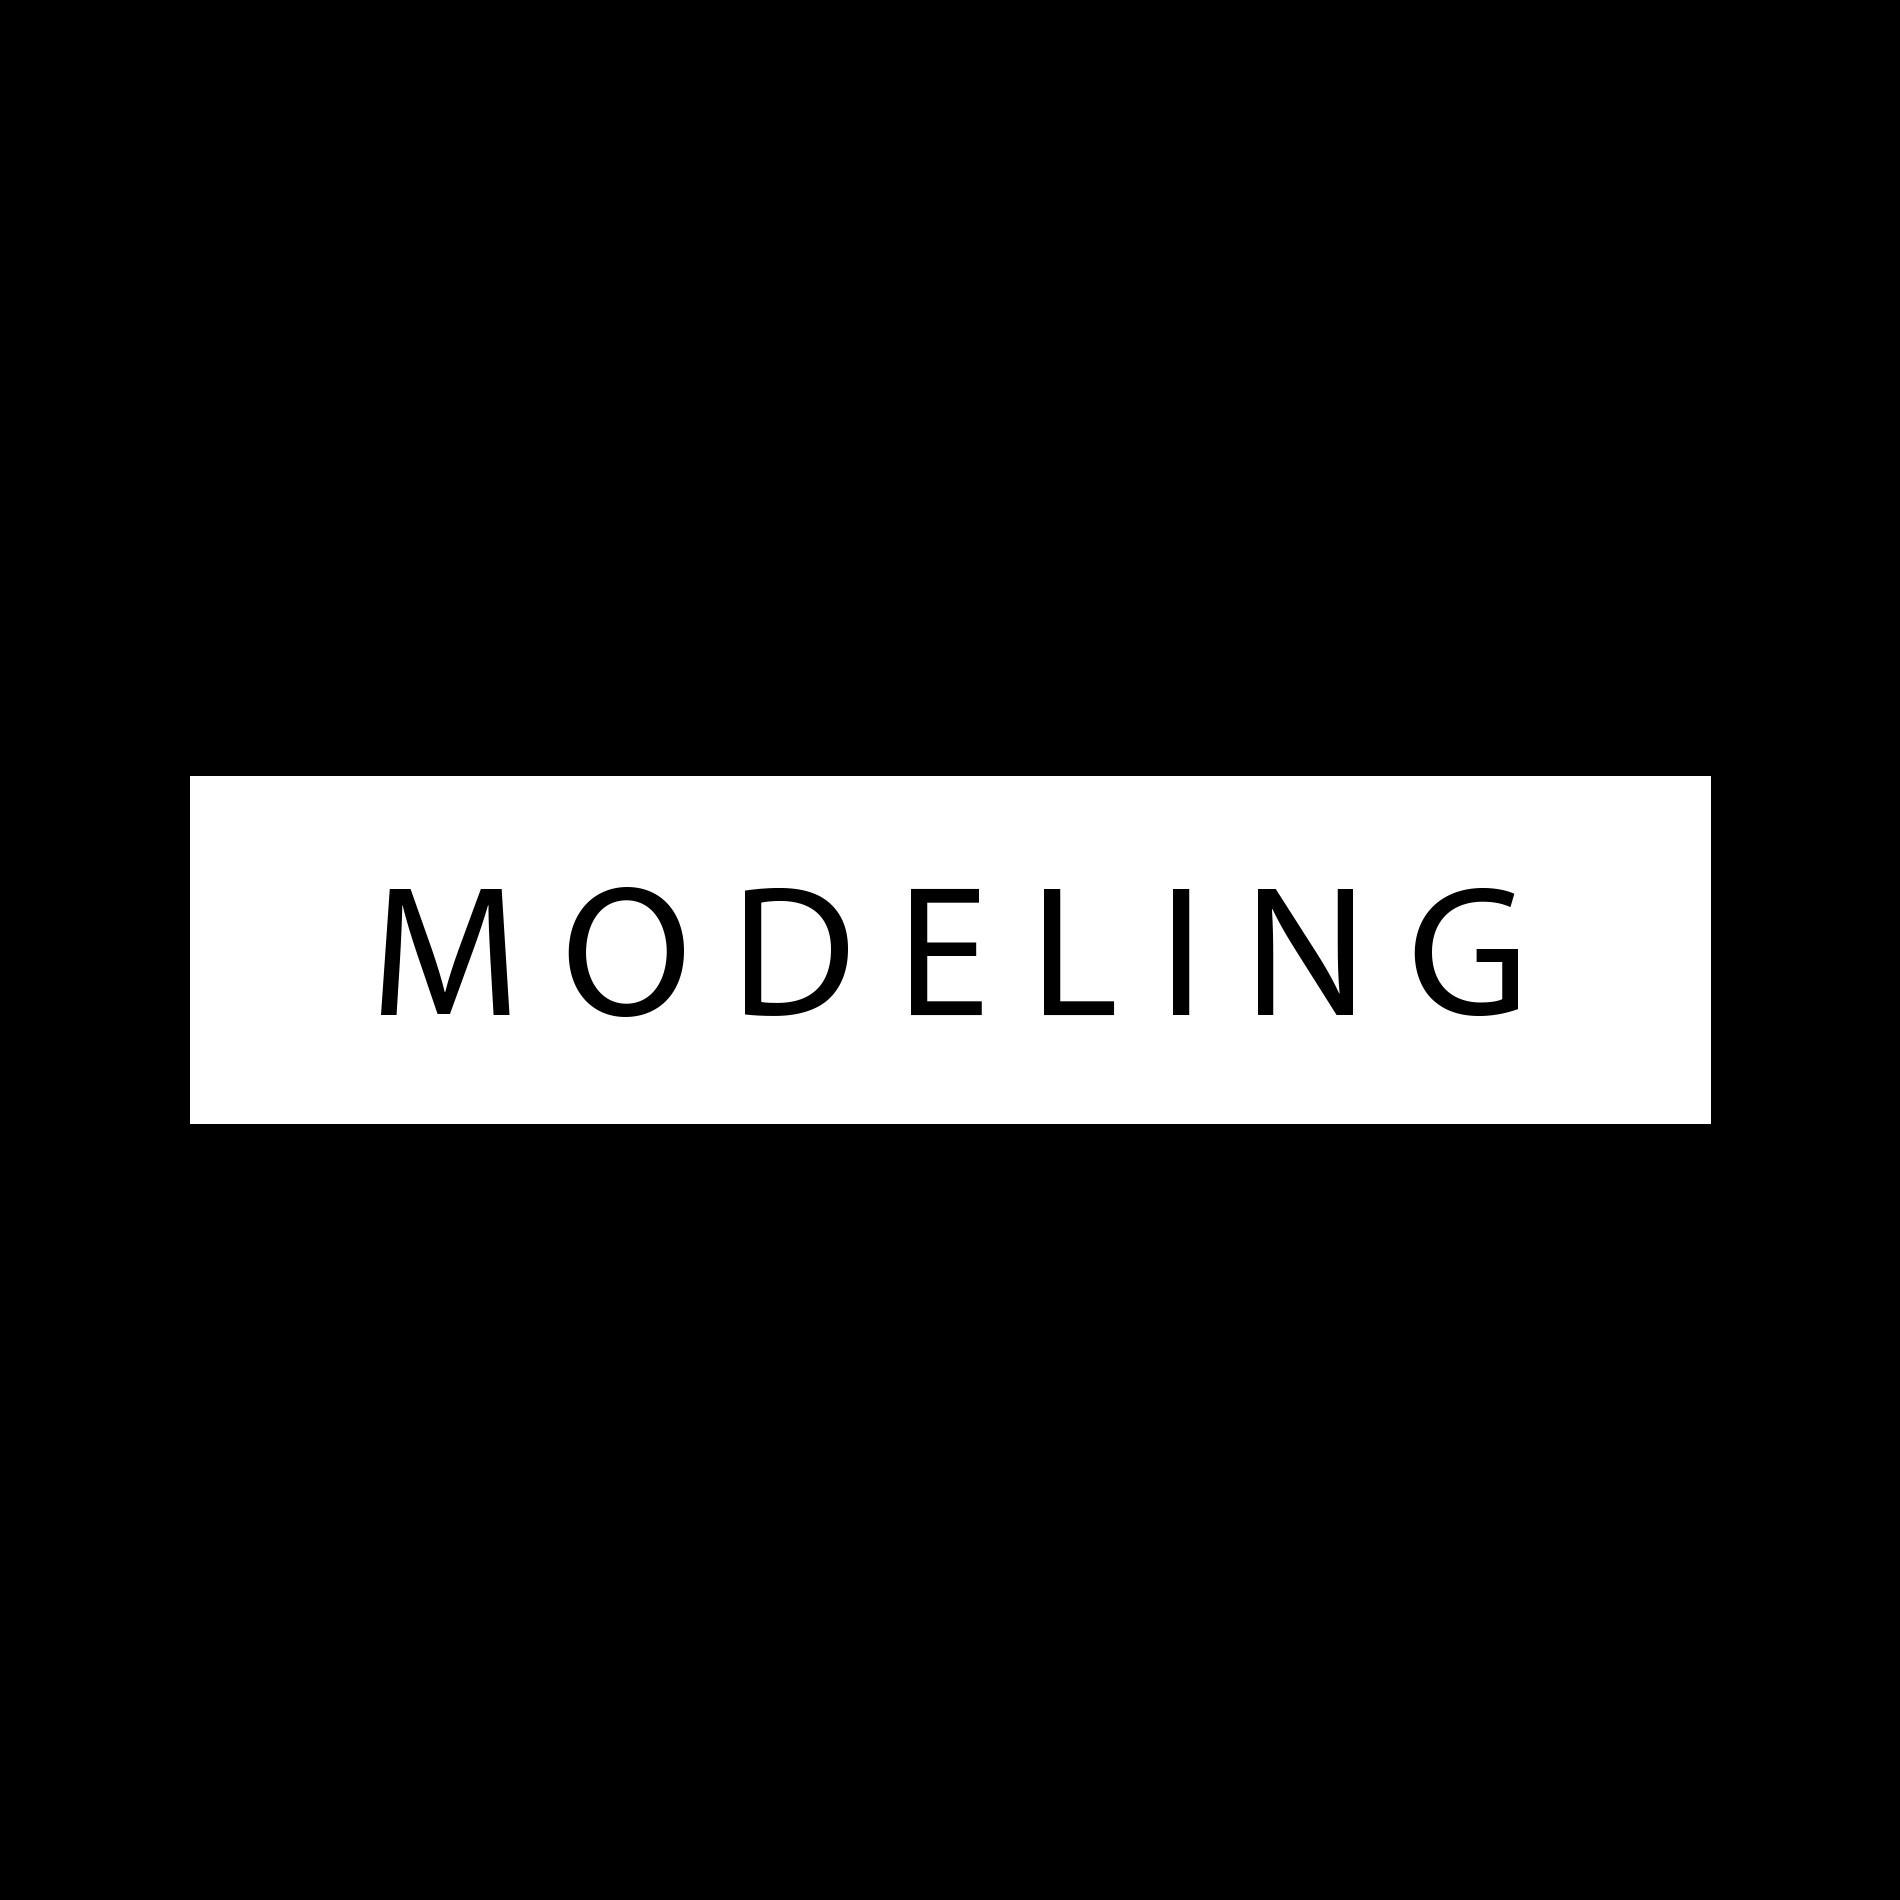 Fabricio rezende fabricio rezende modeling